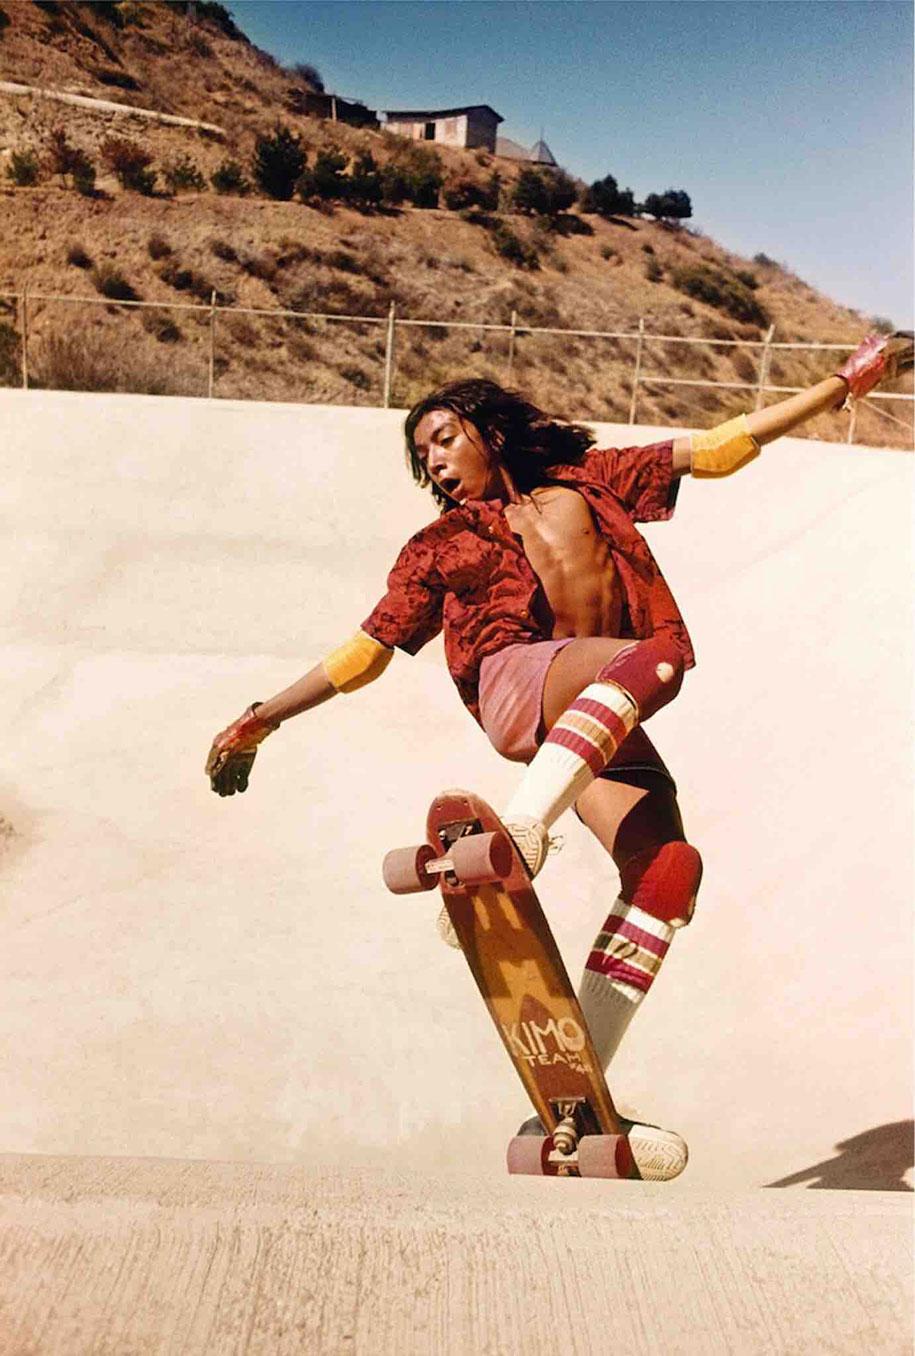 1970-California-skateboard-skater-kids-locals-only-hugh-holland-38